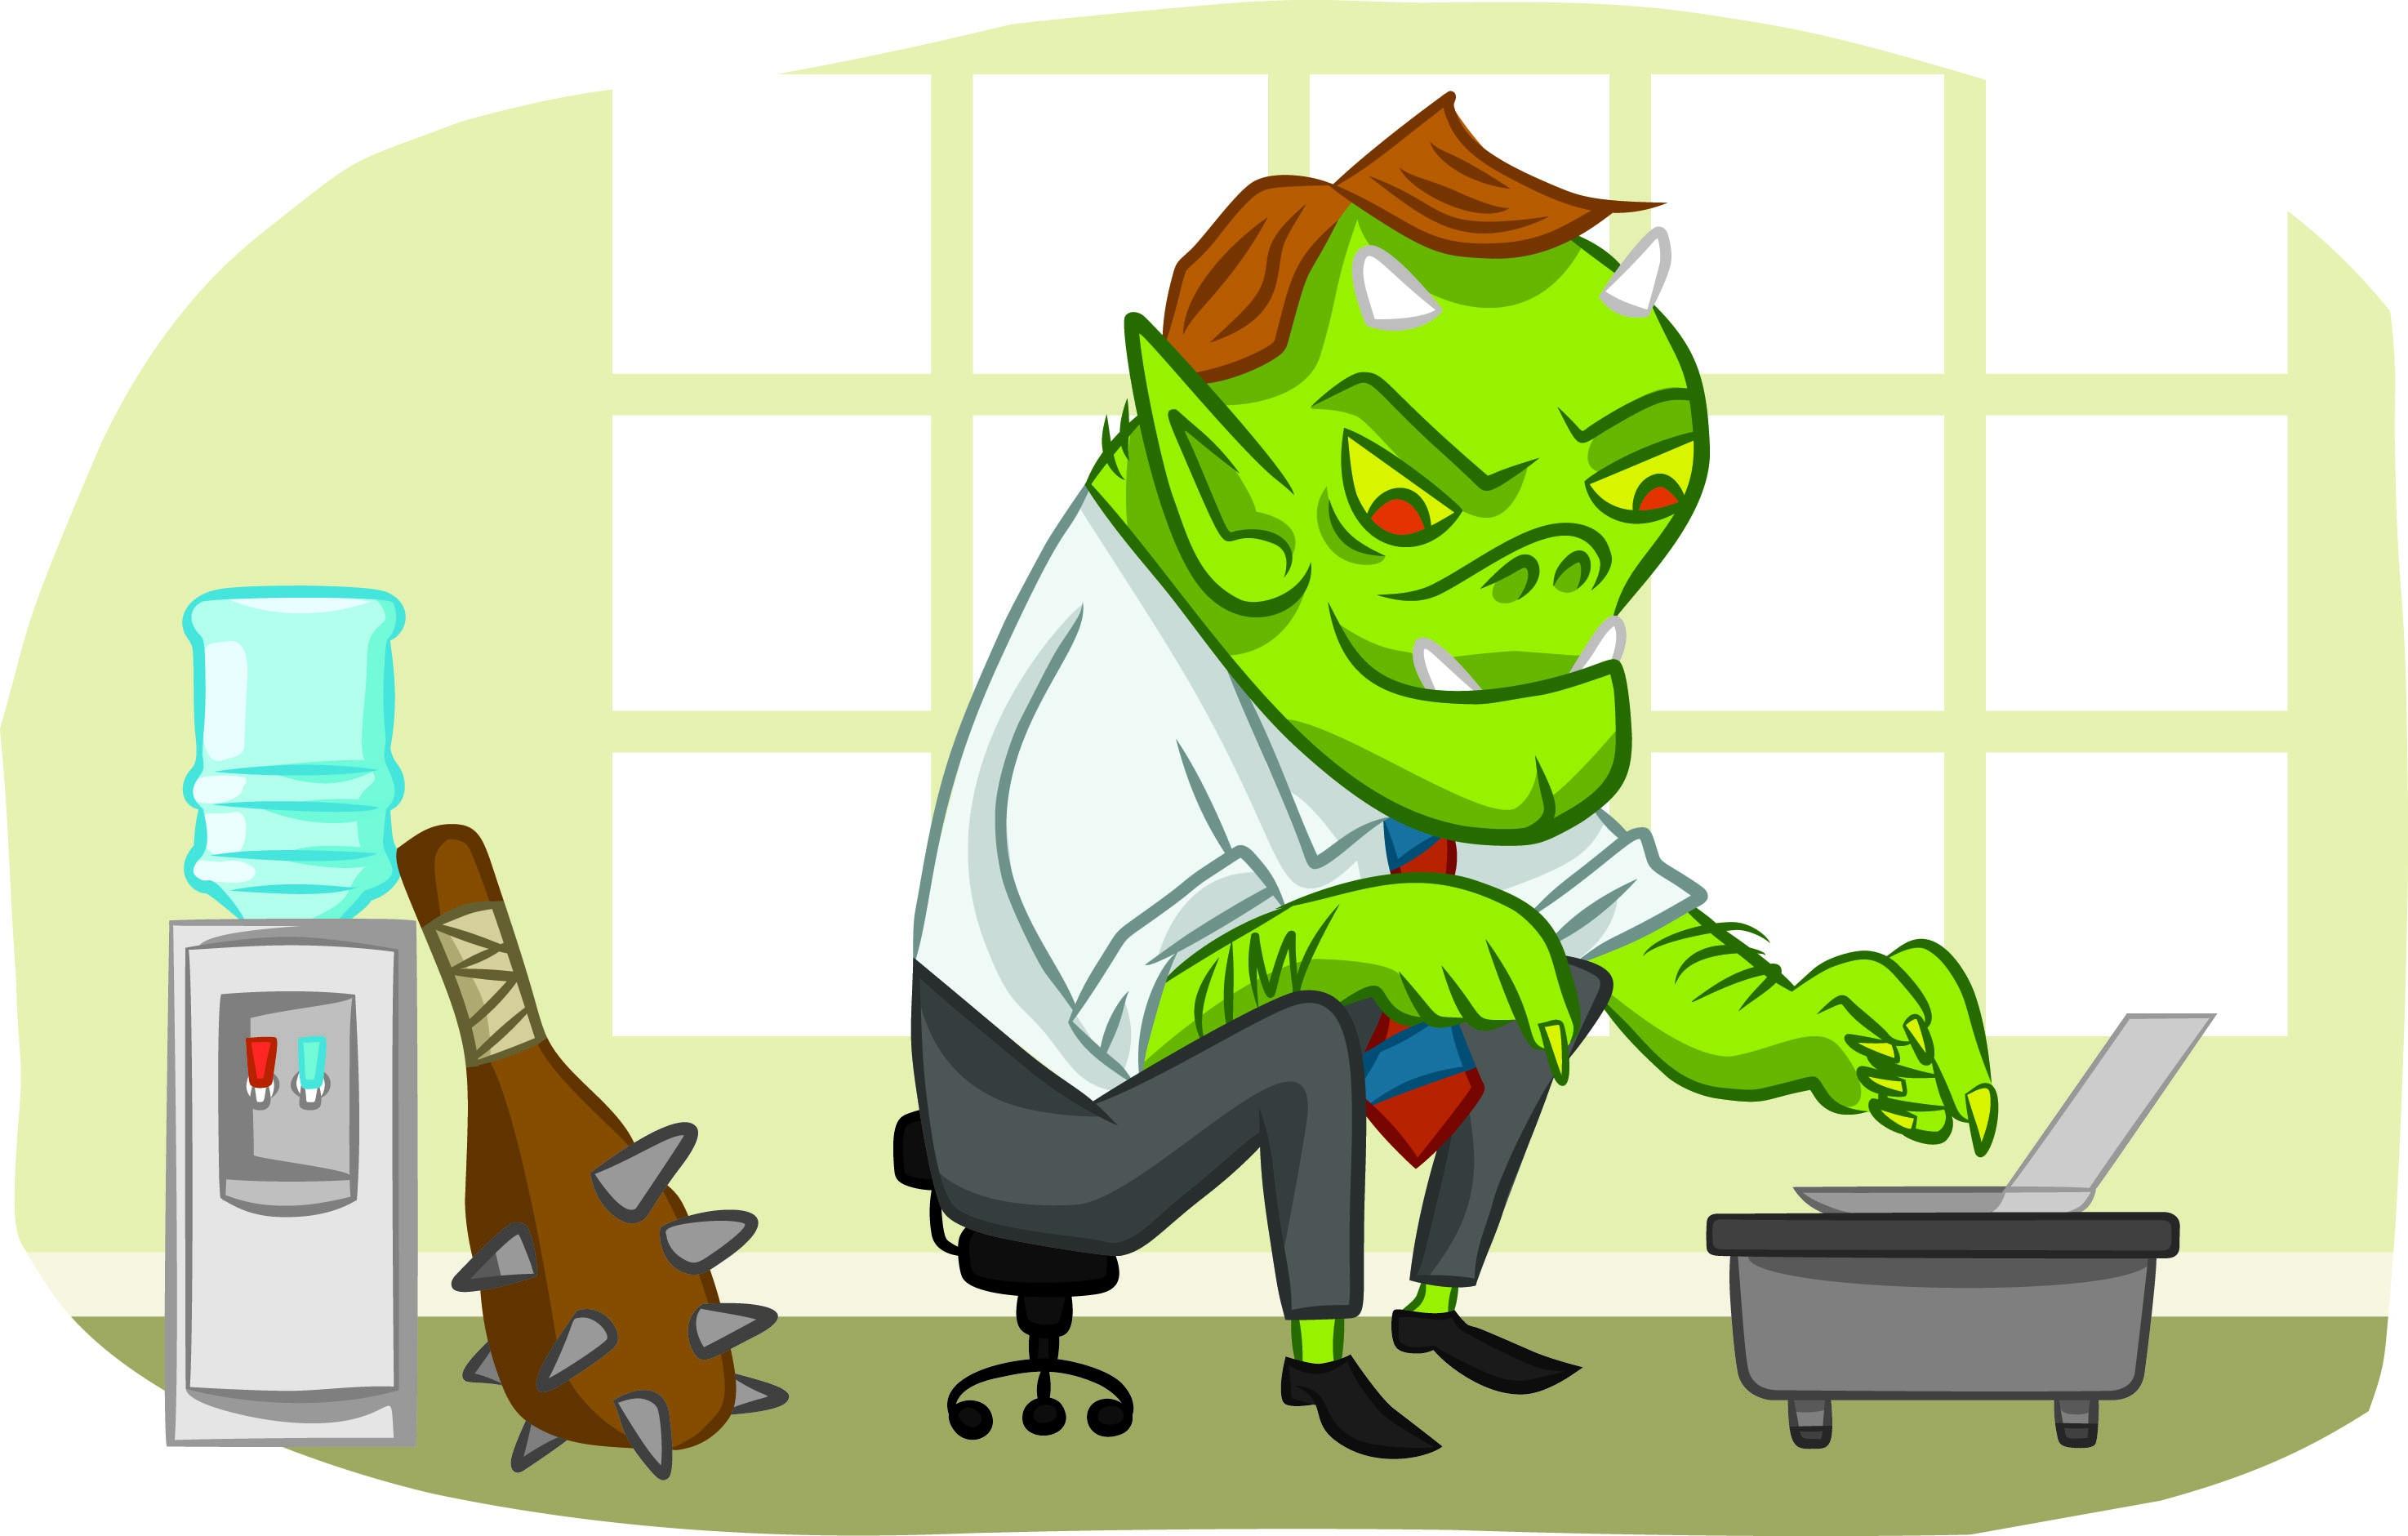 541230-don-t-be-a-troll.jpg